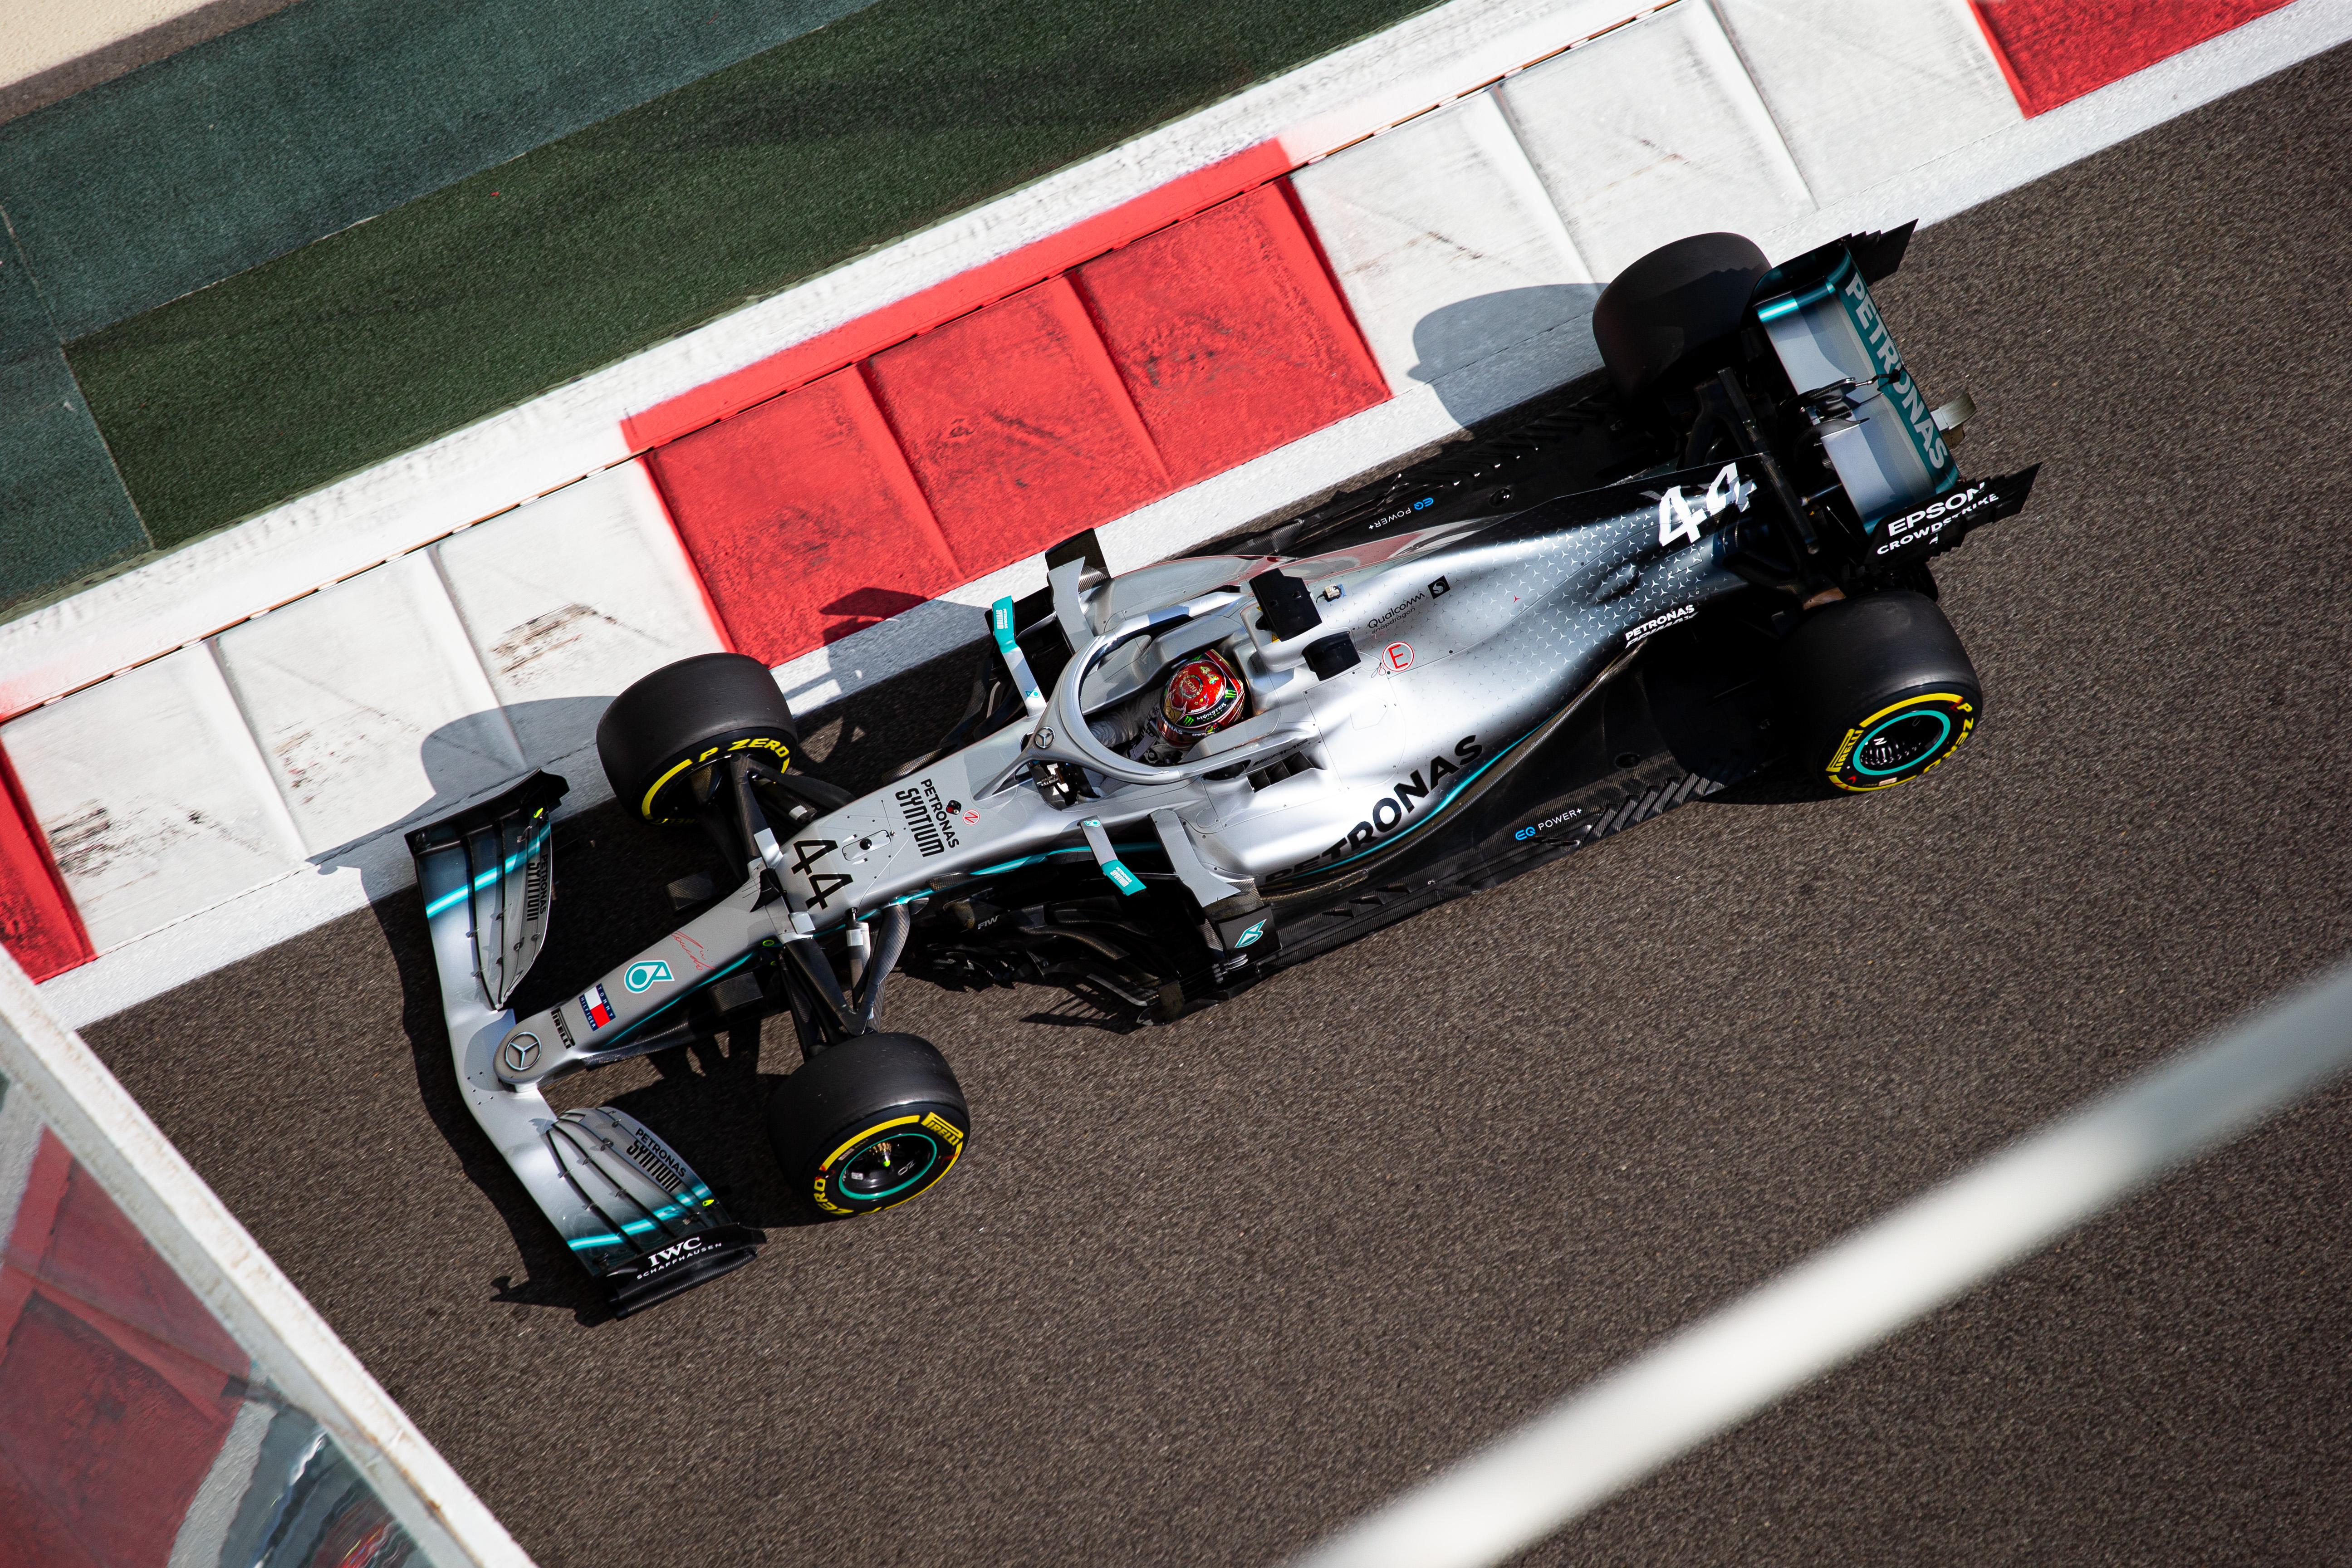 Mercedes F1 Abu Dhabi 2019